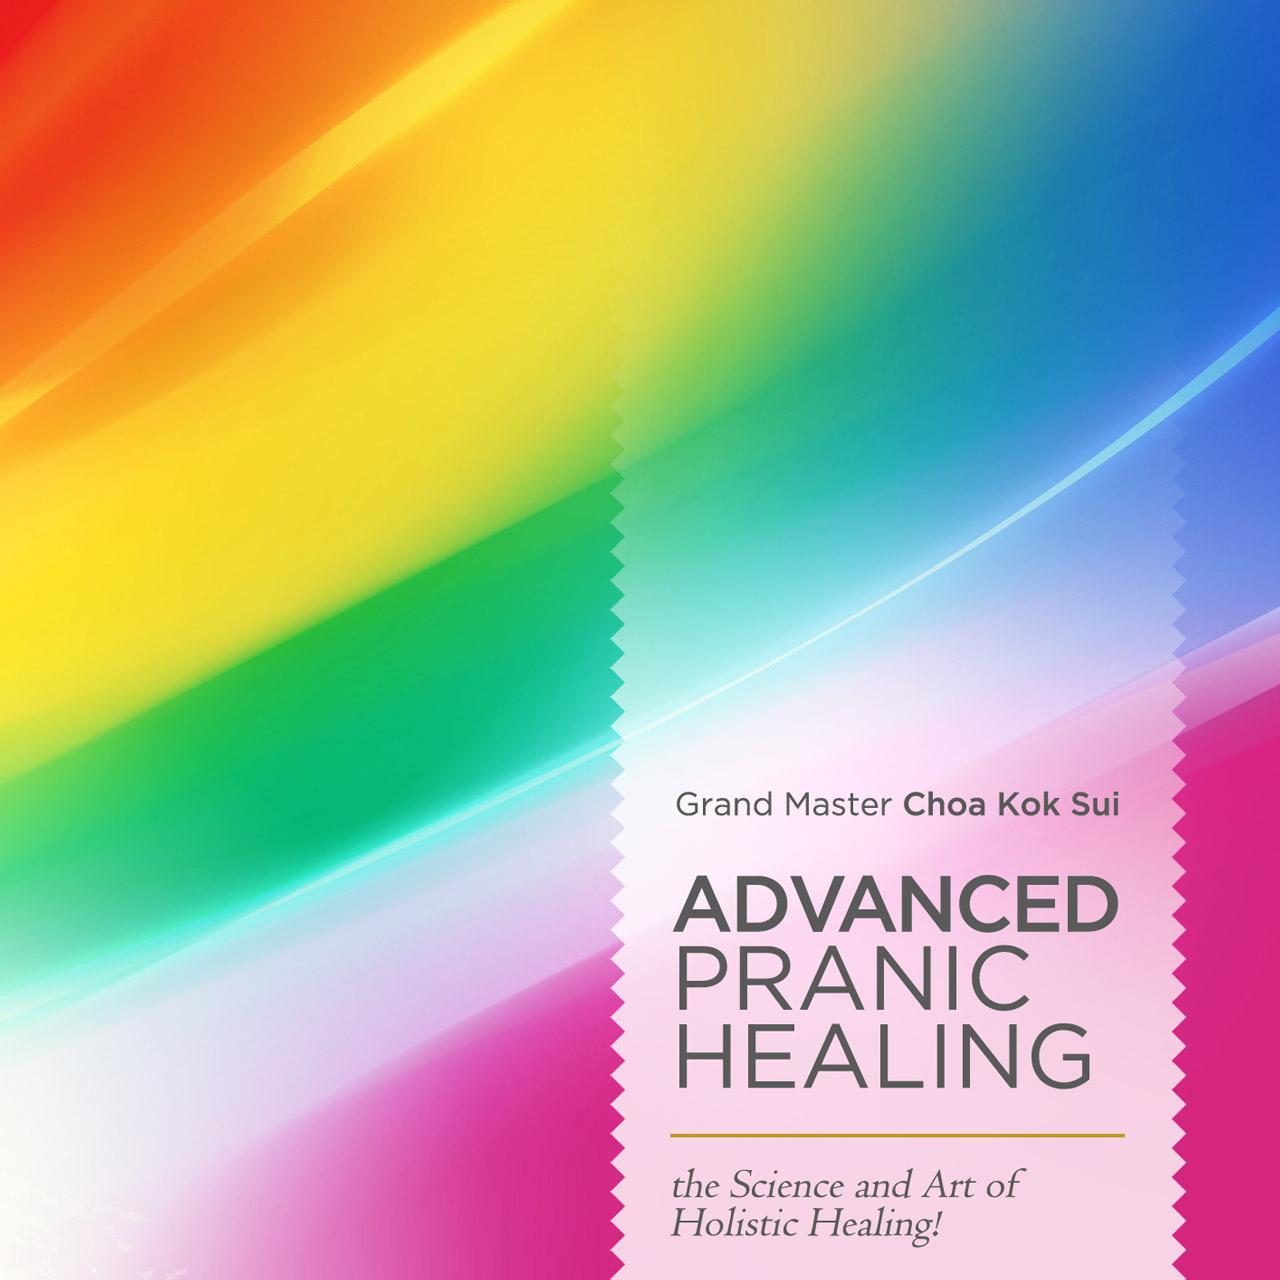 Advanced Pranic Healing Workshop